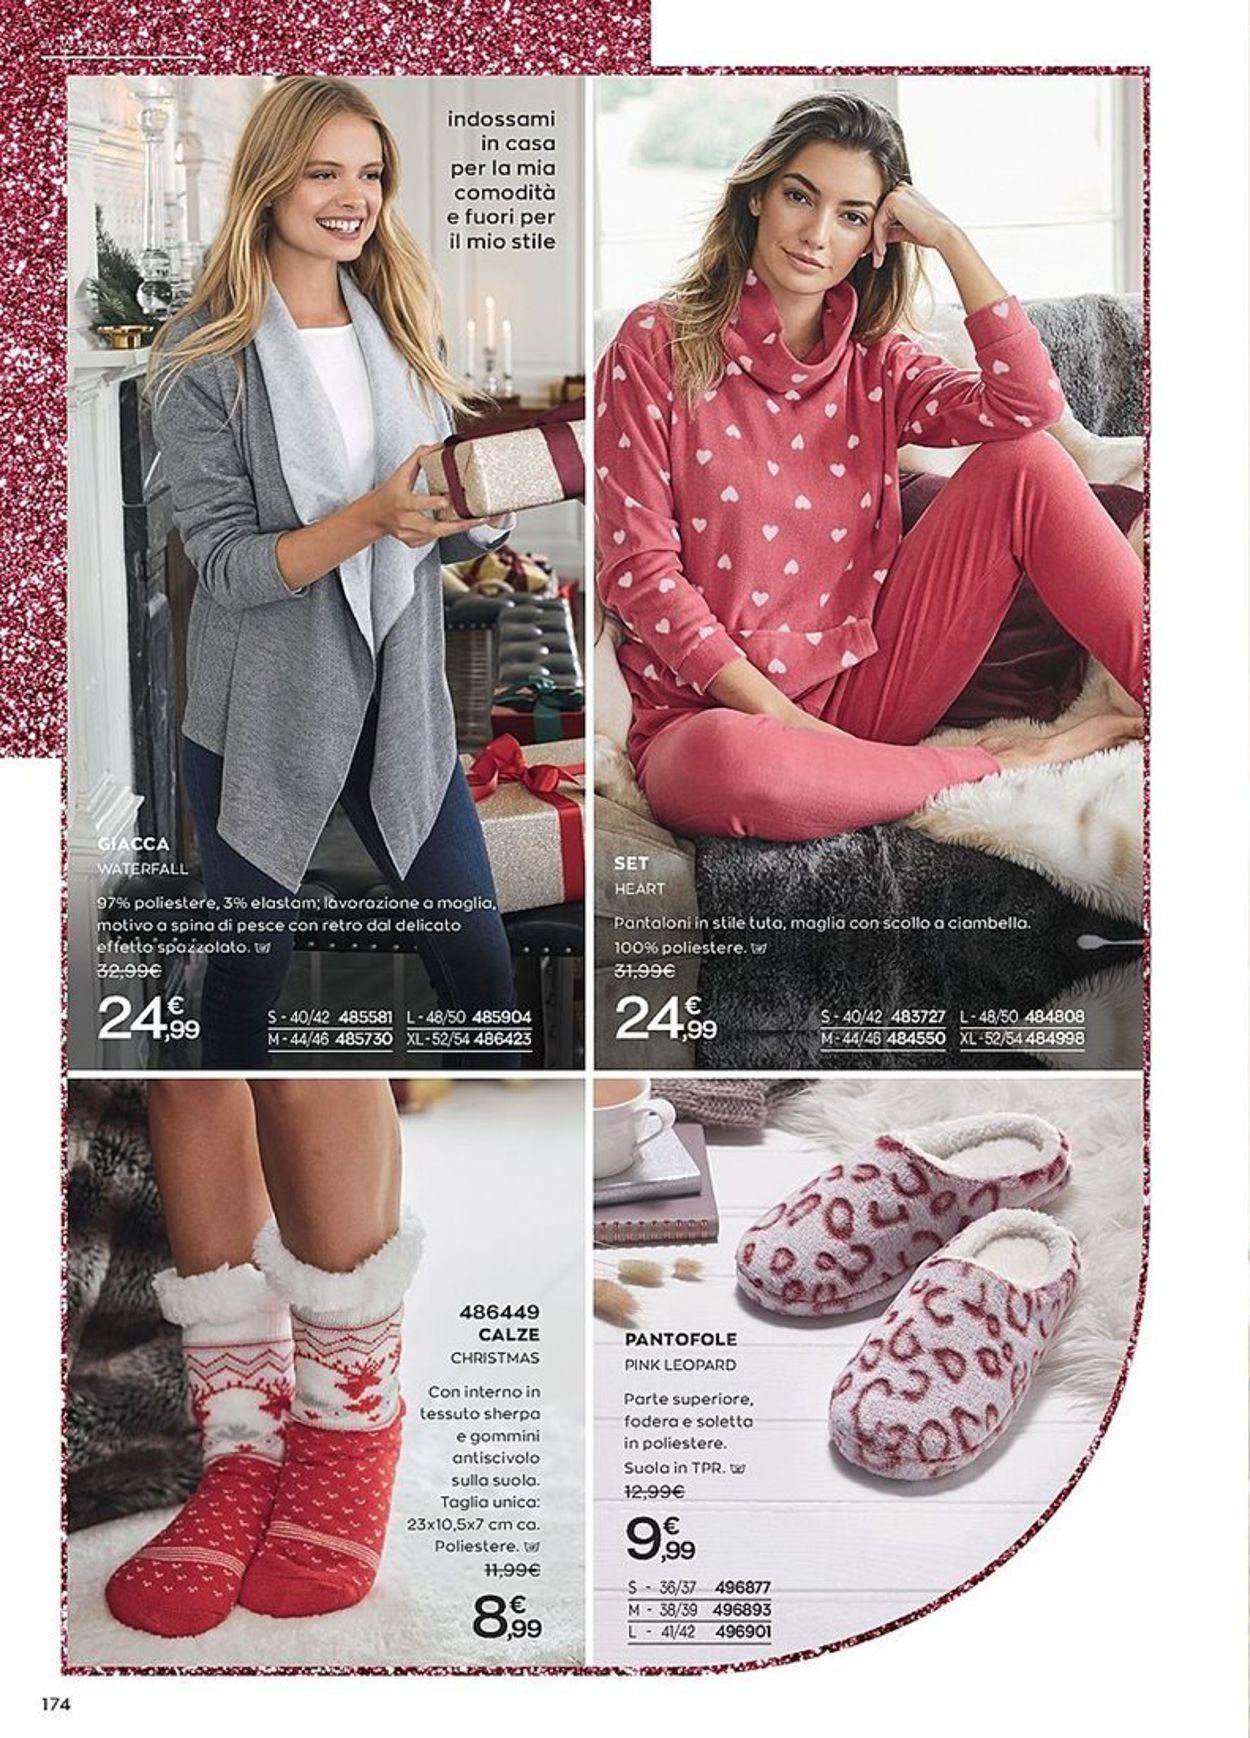 Volantino Avon - Natale 2020 - Offerte 01/12-31/12/2020 (Pagina 176)